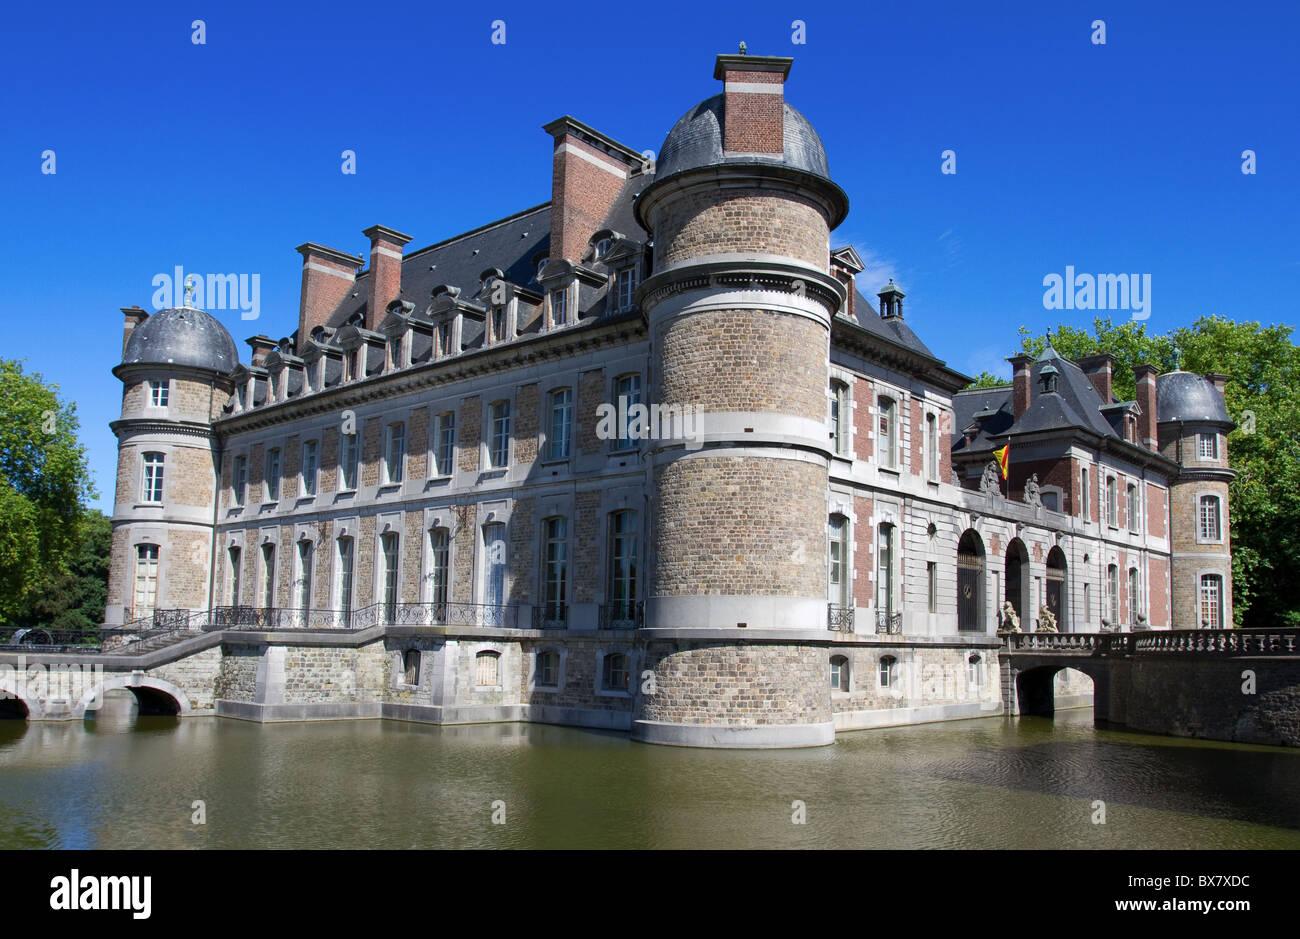 Castle Belœil with moat in Belgium - Stock Image